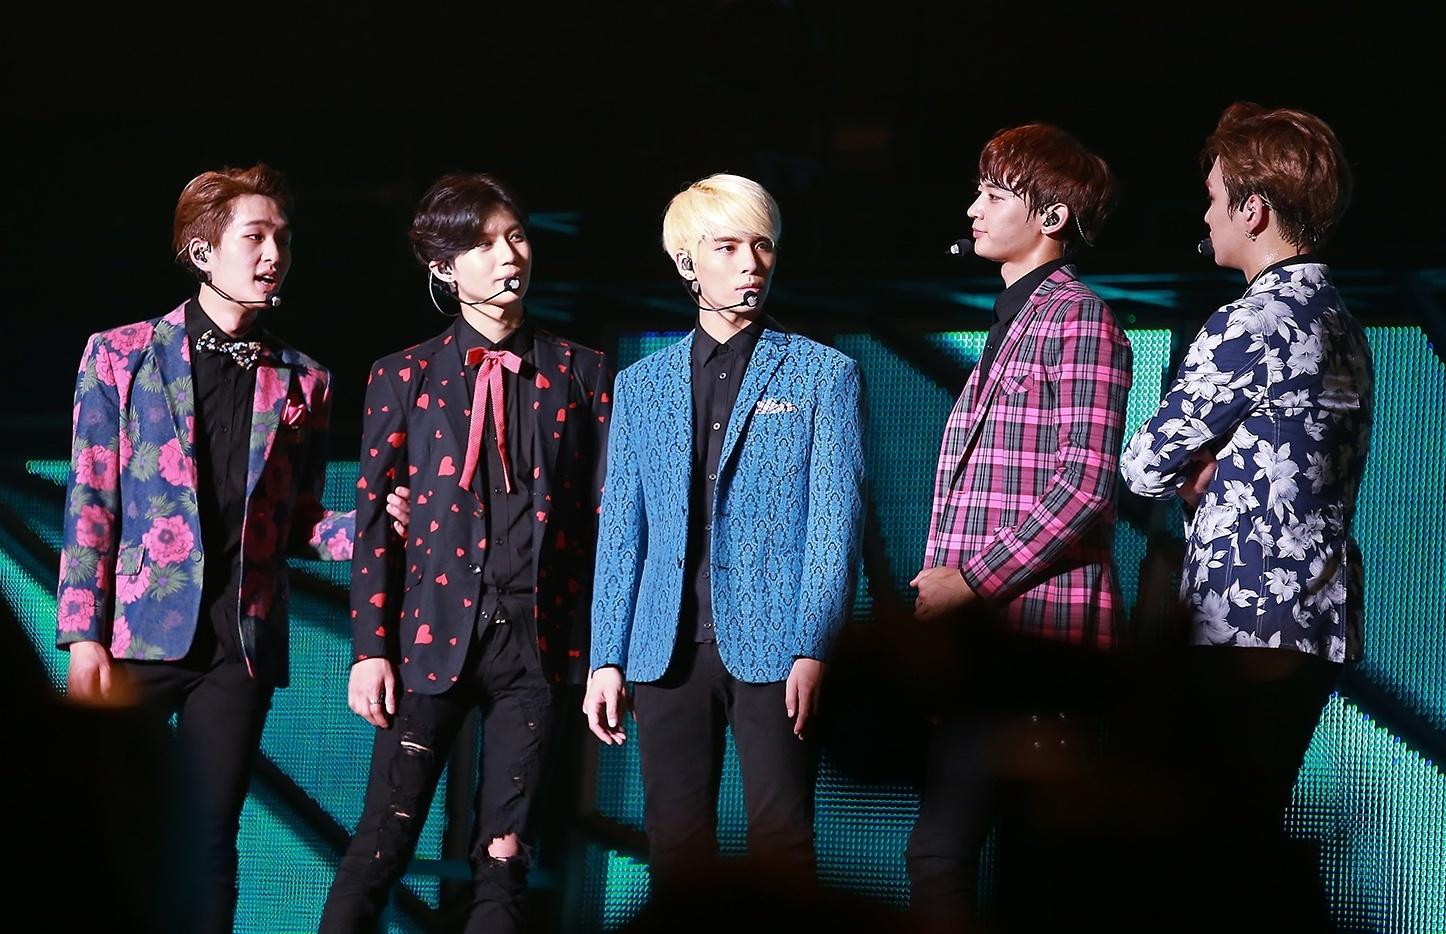 Shinee_at_the_SHINee_World_Concert_III_in_Taiwan